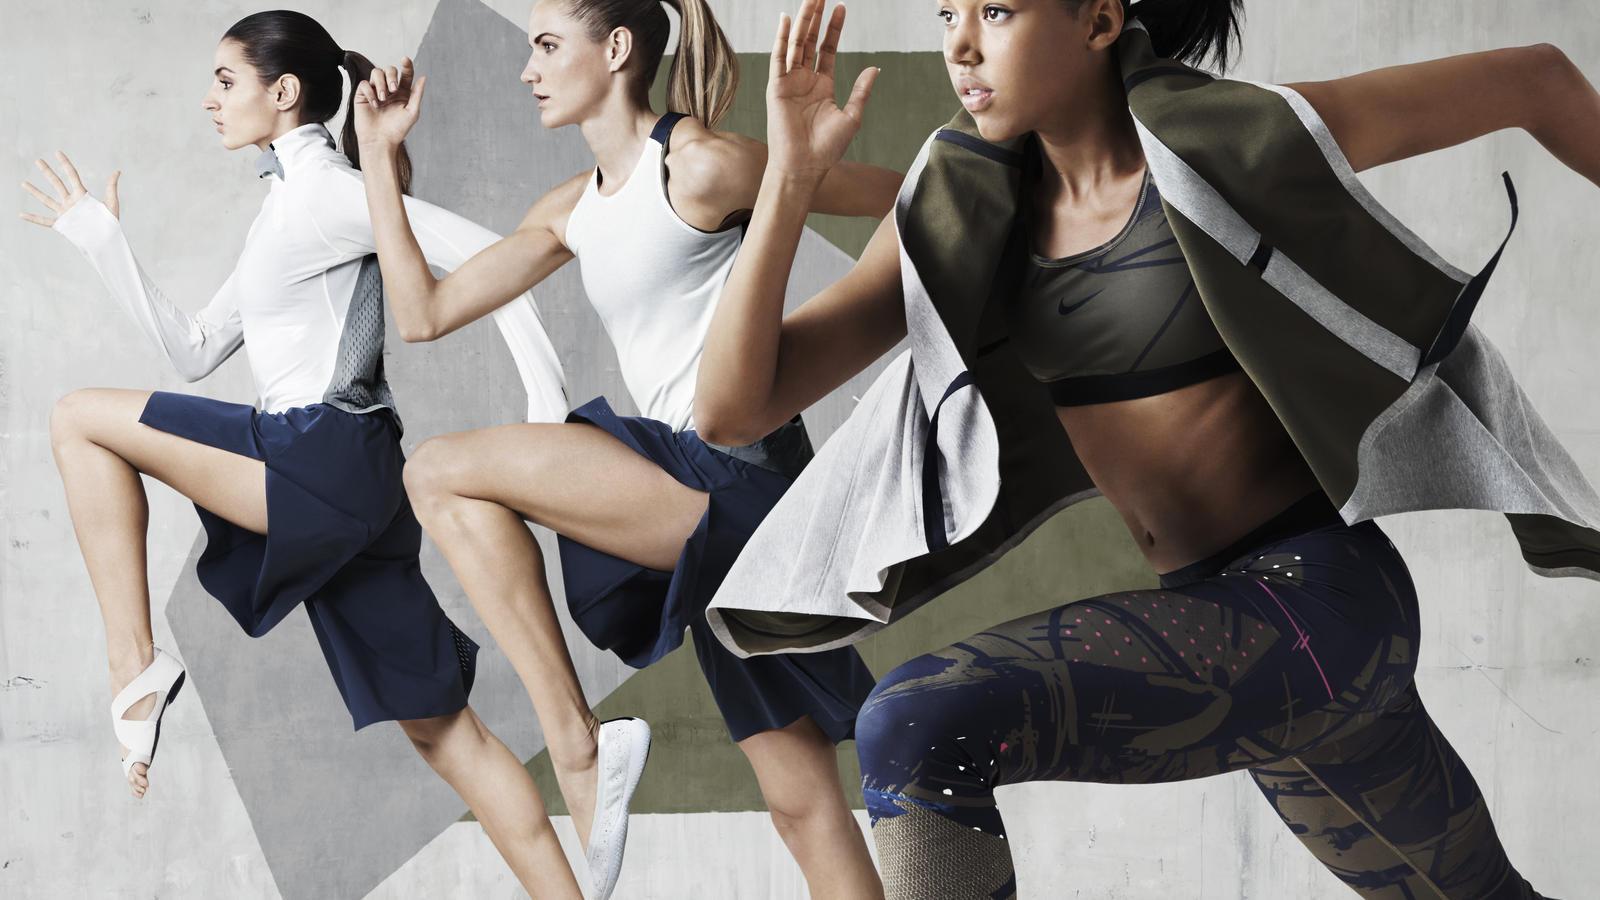 NikeLab x JFS Collection